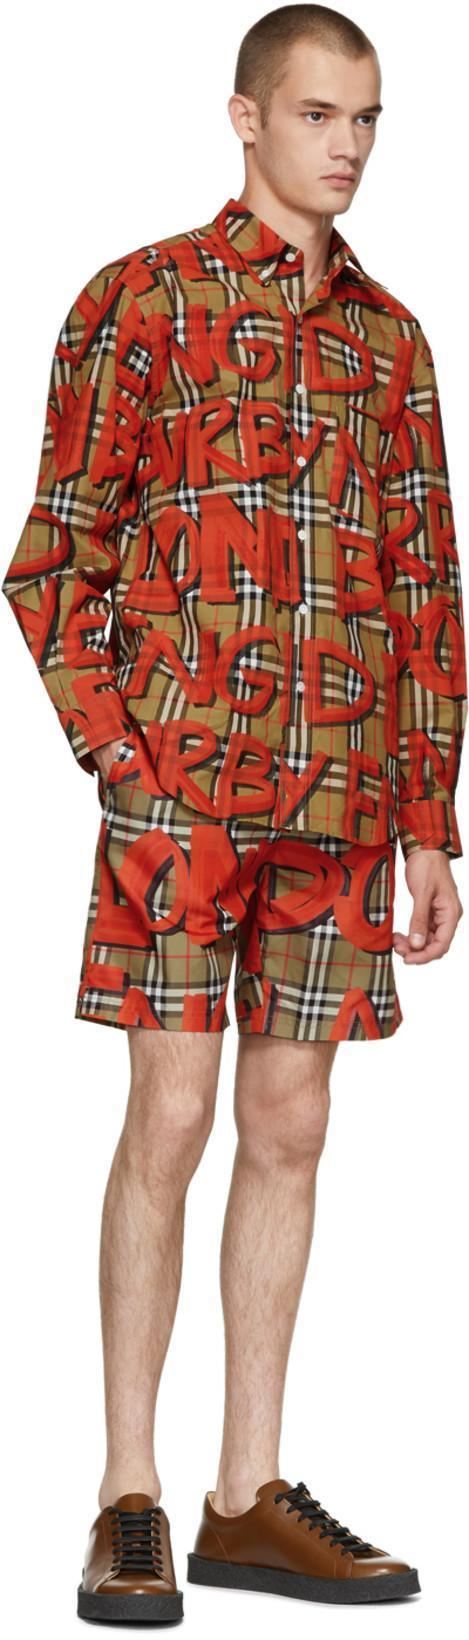 1b7cb3d48d Burberry Graffiti Print Vintage Check Drawcord Swim Shorts In Brown ...